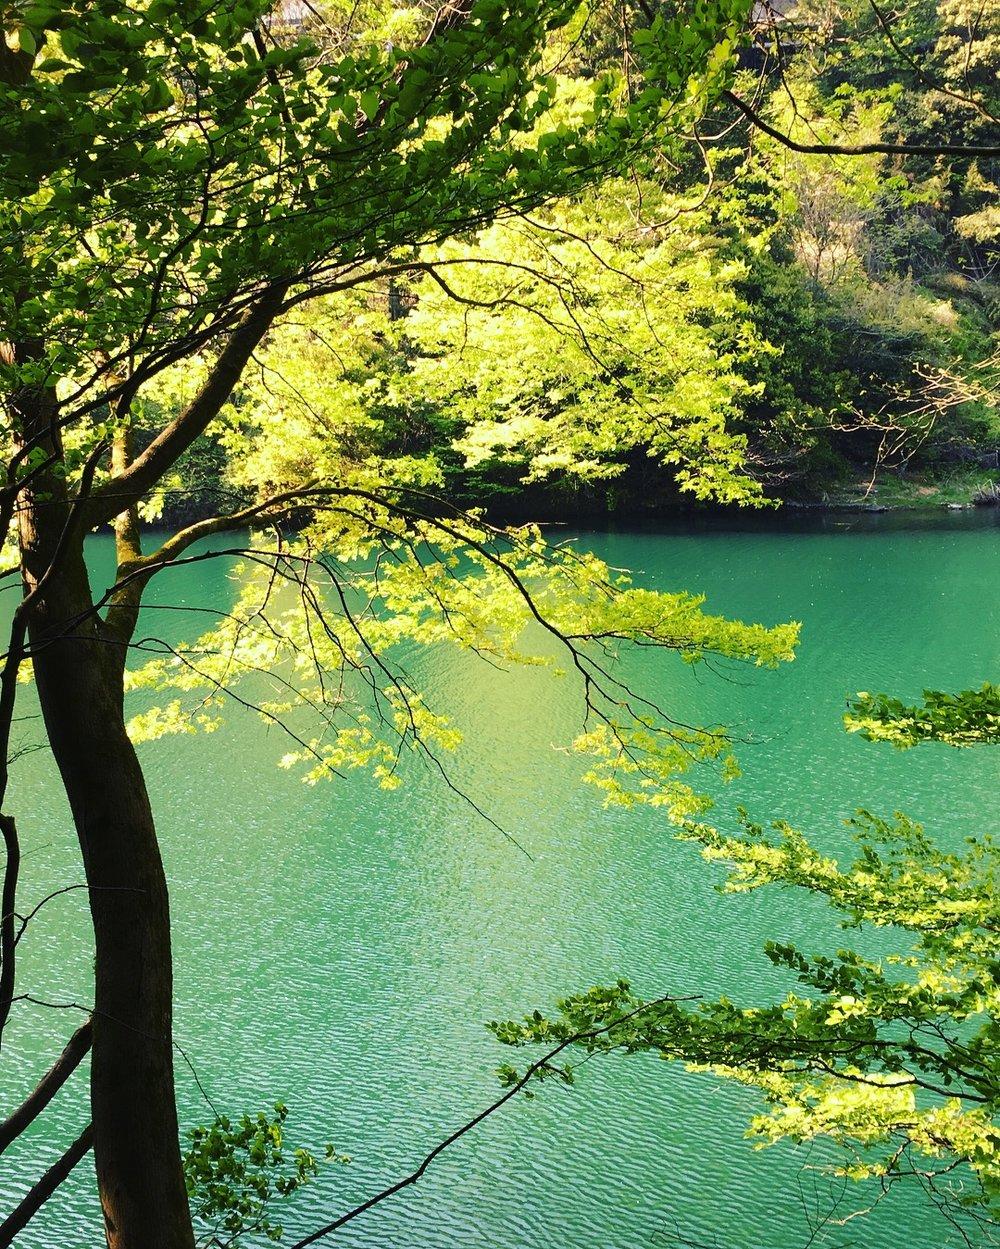 Hiking the Otama Trail in Japan — City Sketch